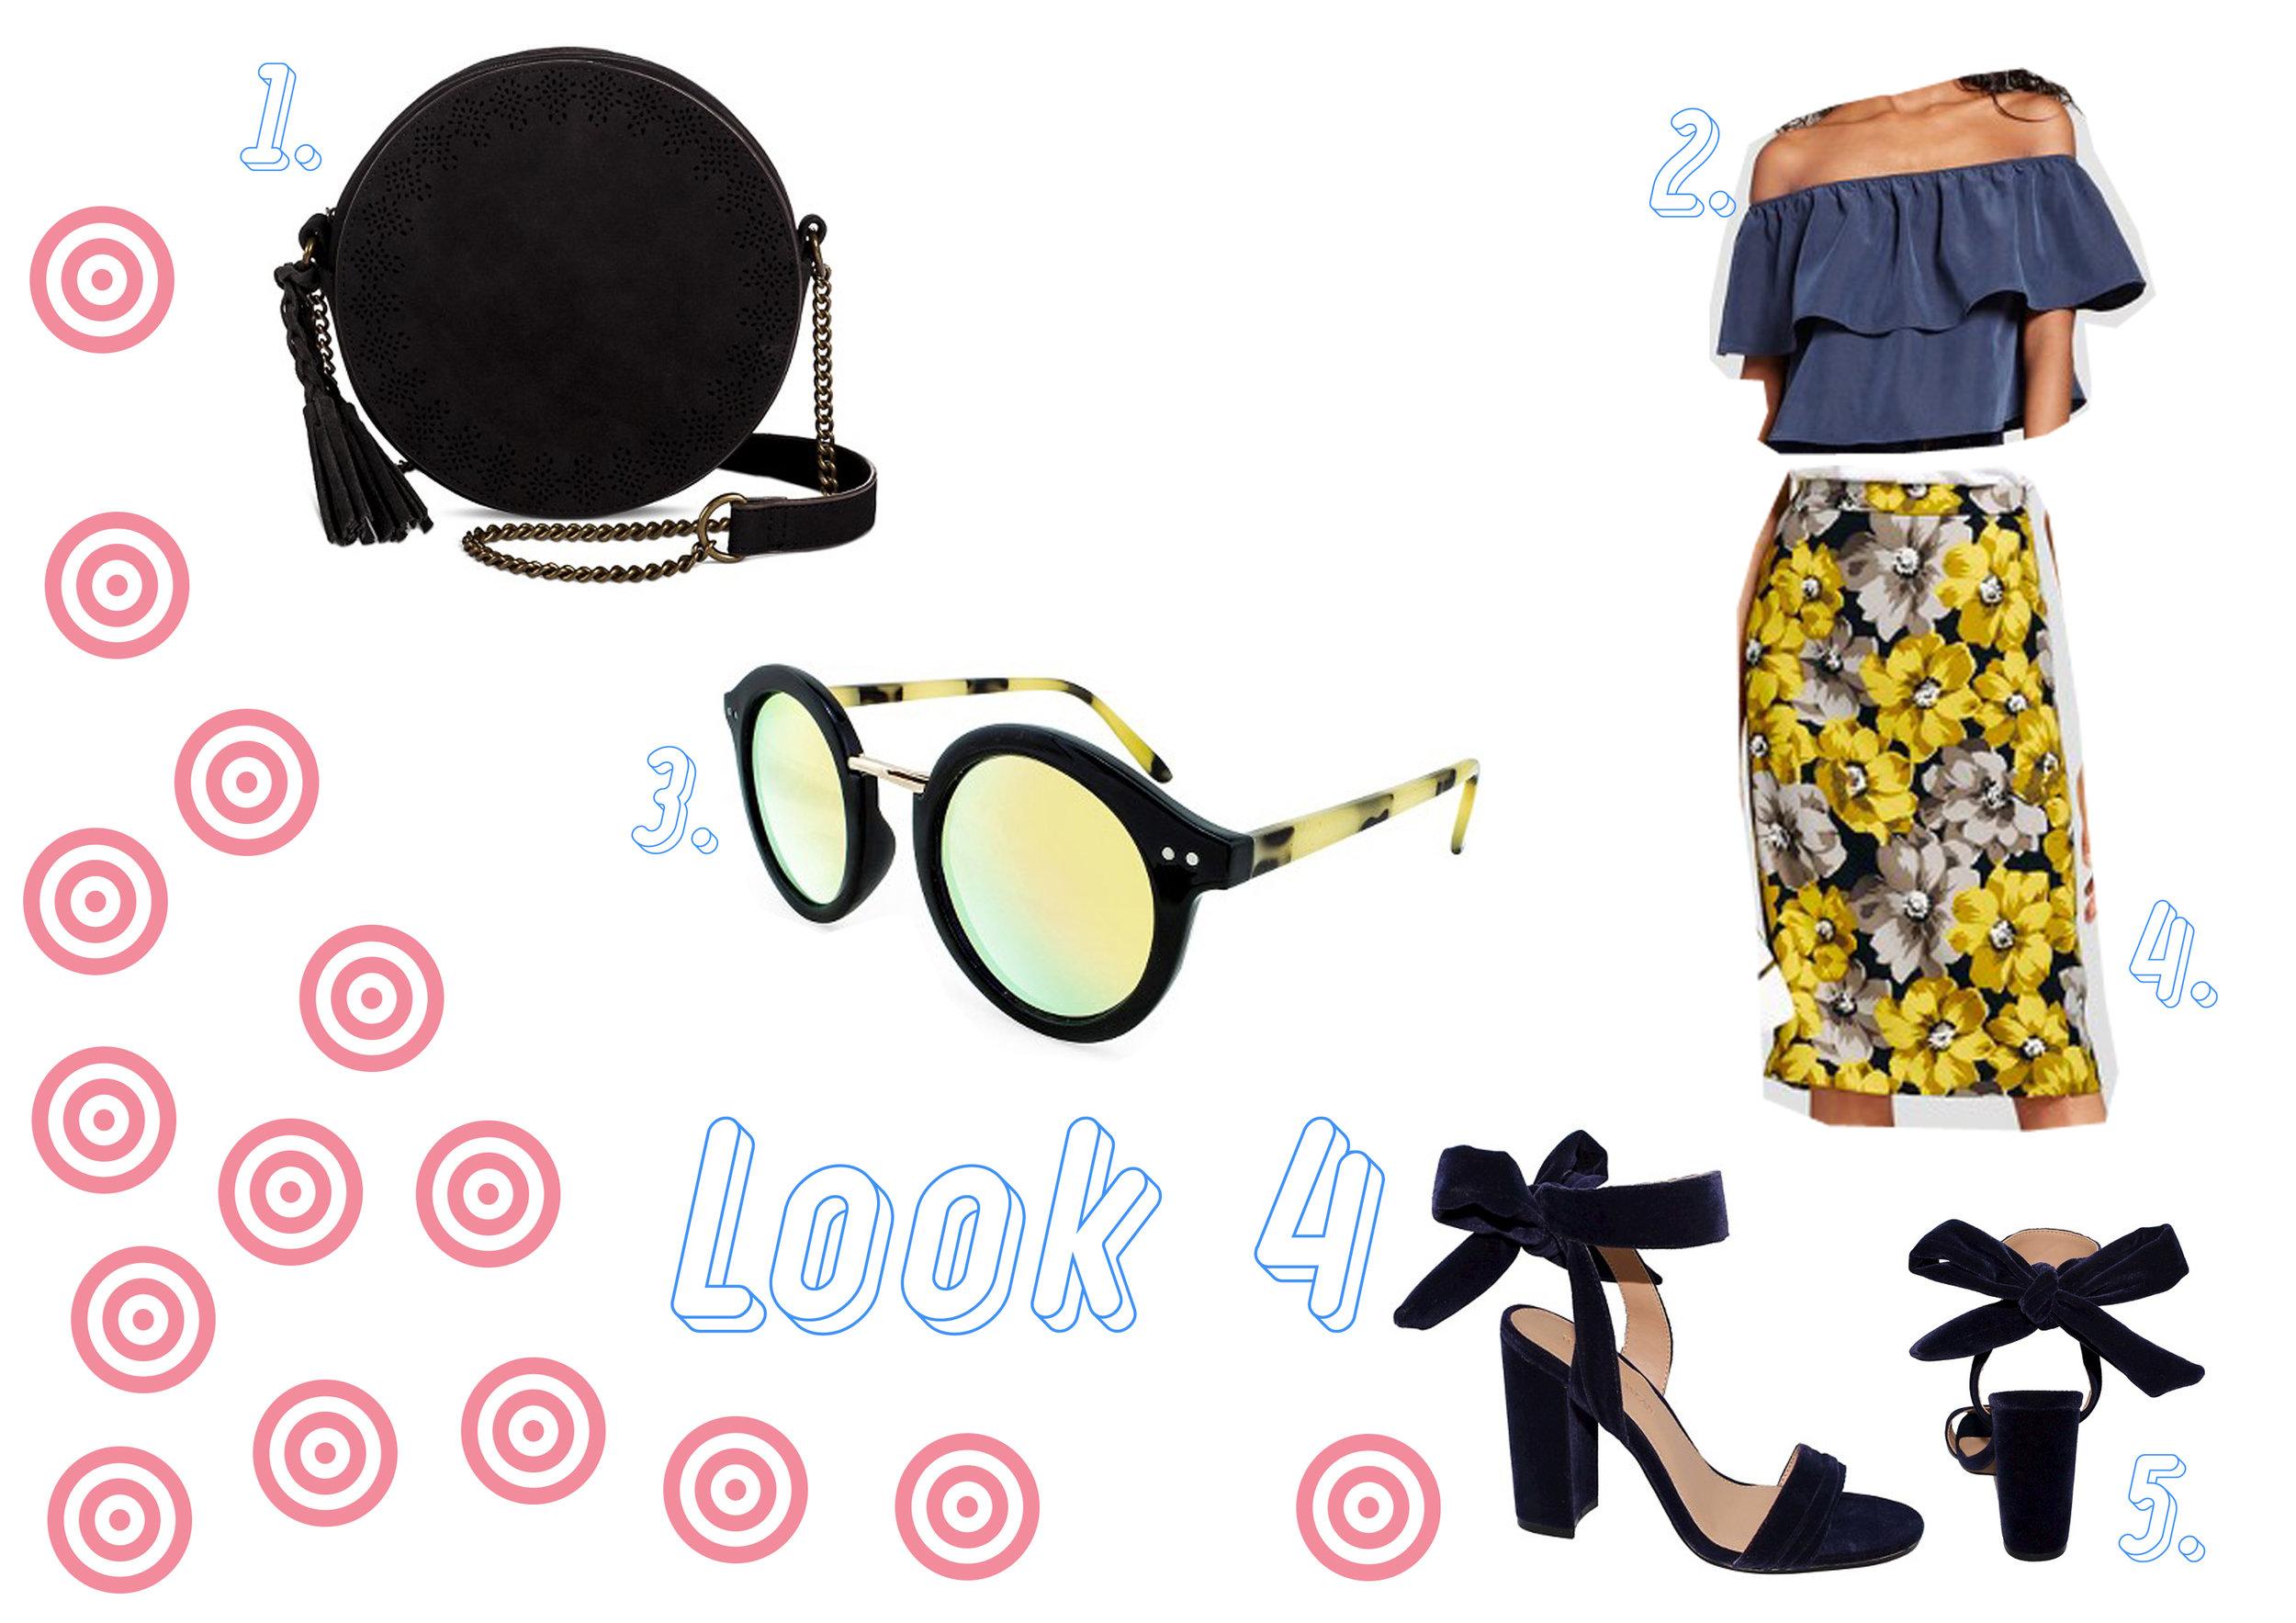 1. Black handbag  here  - 2. Blue flounce top  here  - 3. Yellow sunglasses  here  - 4. Yellow skirt  here  - 5. Blue velvet shoes  here